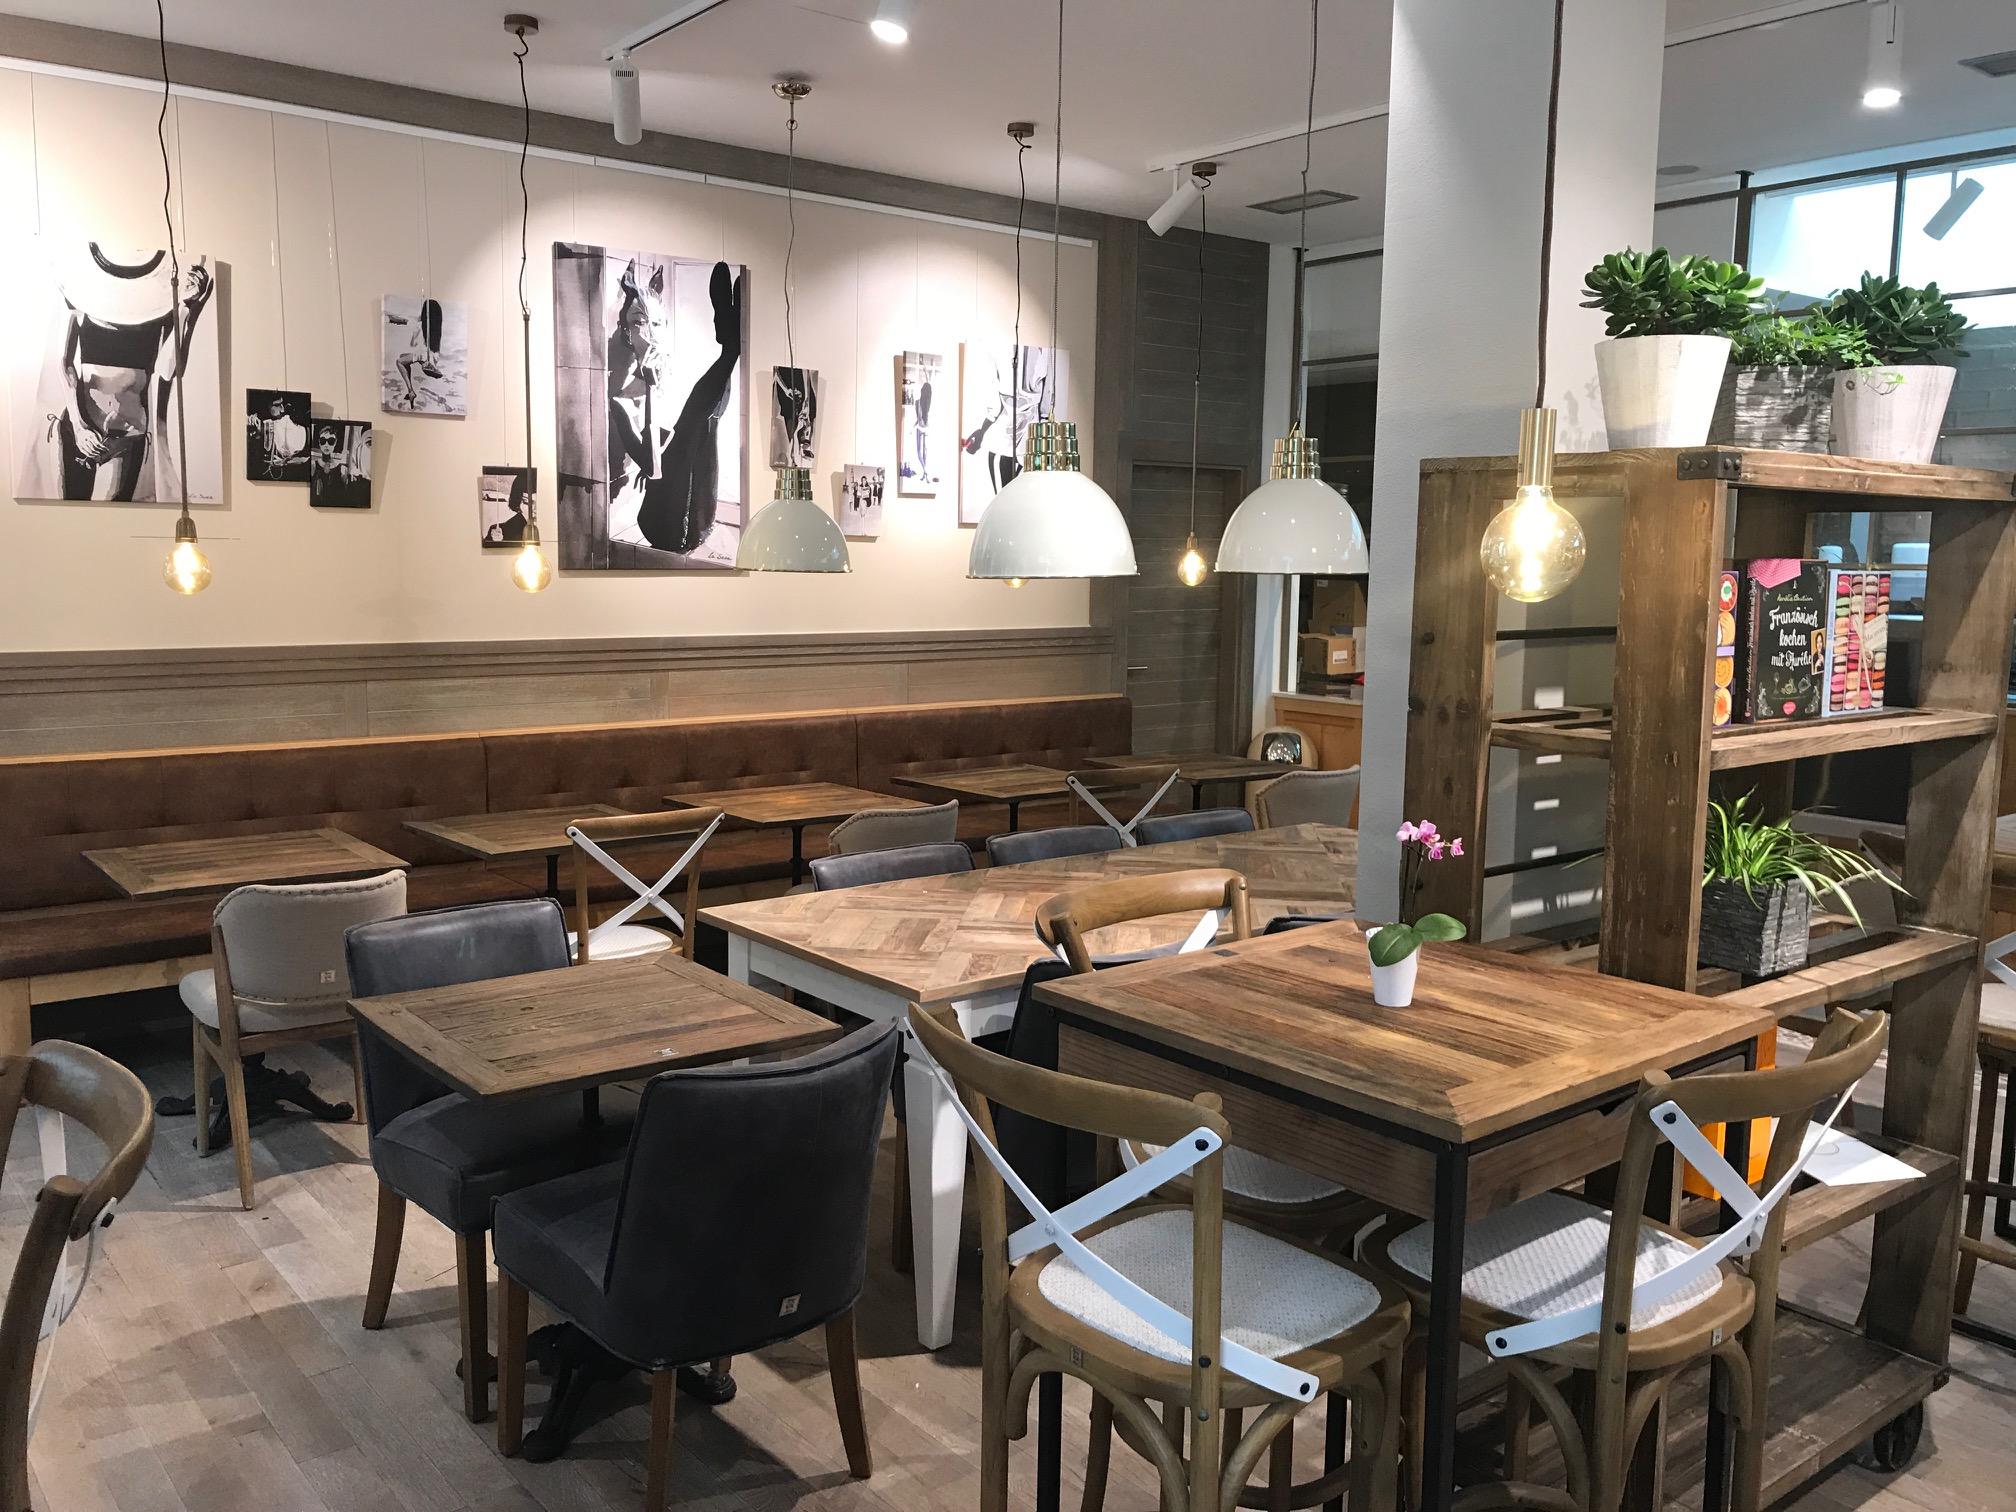 cafe bar club in munchen infobel deutschland. Black Bedroom Furniture Sets. Home Design Ideas